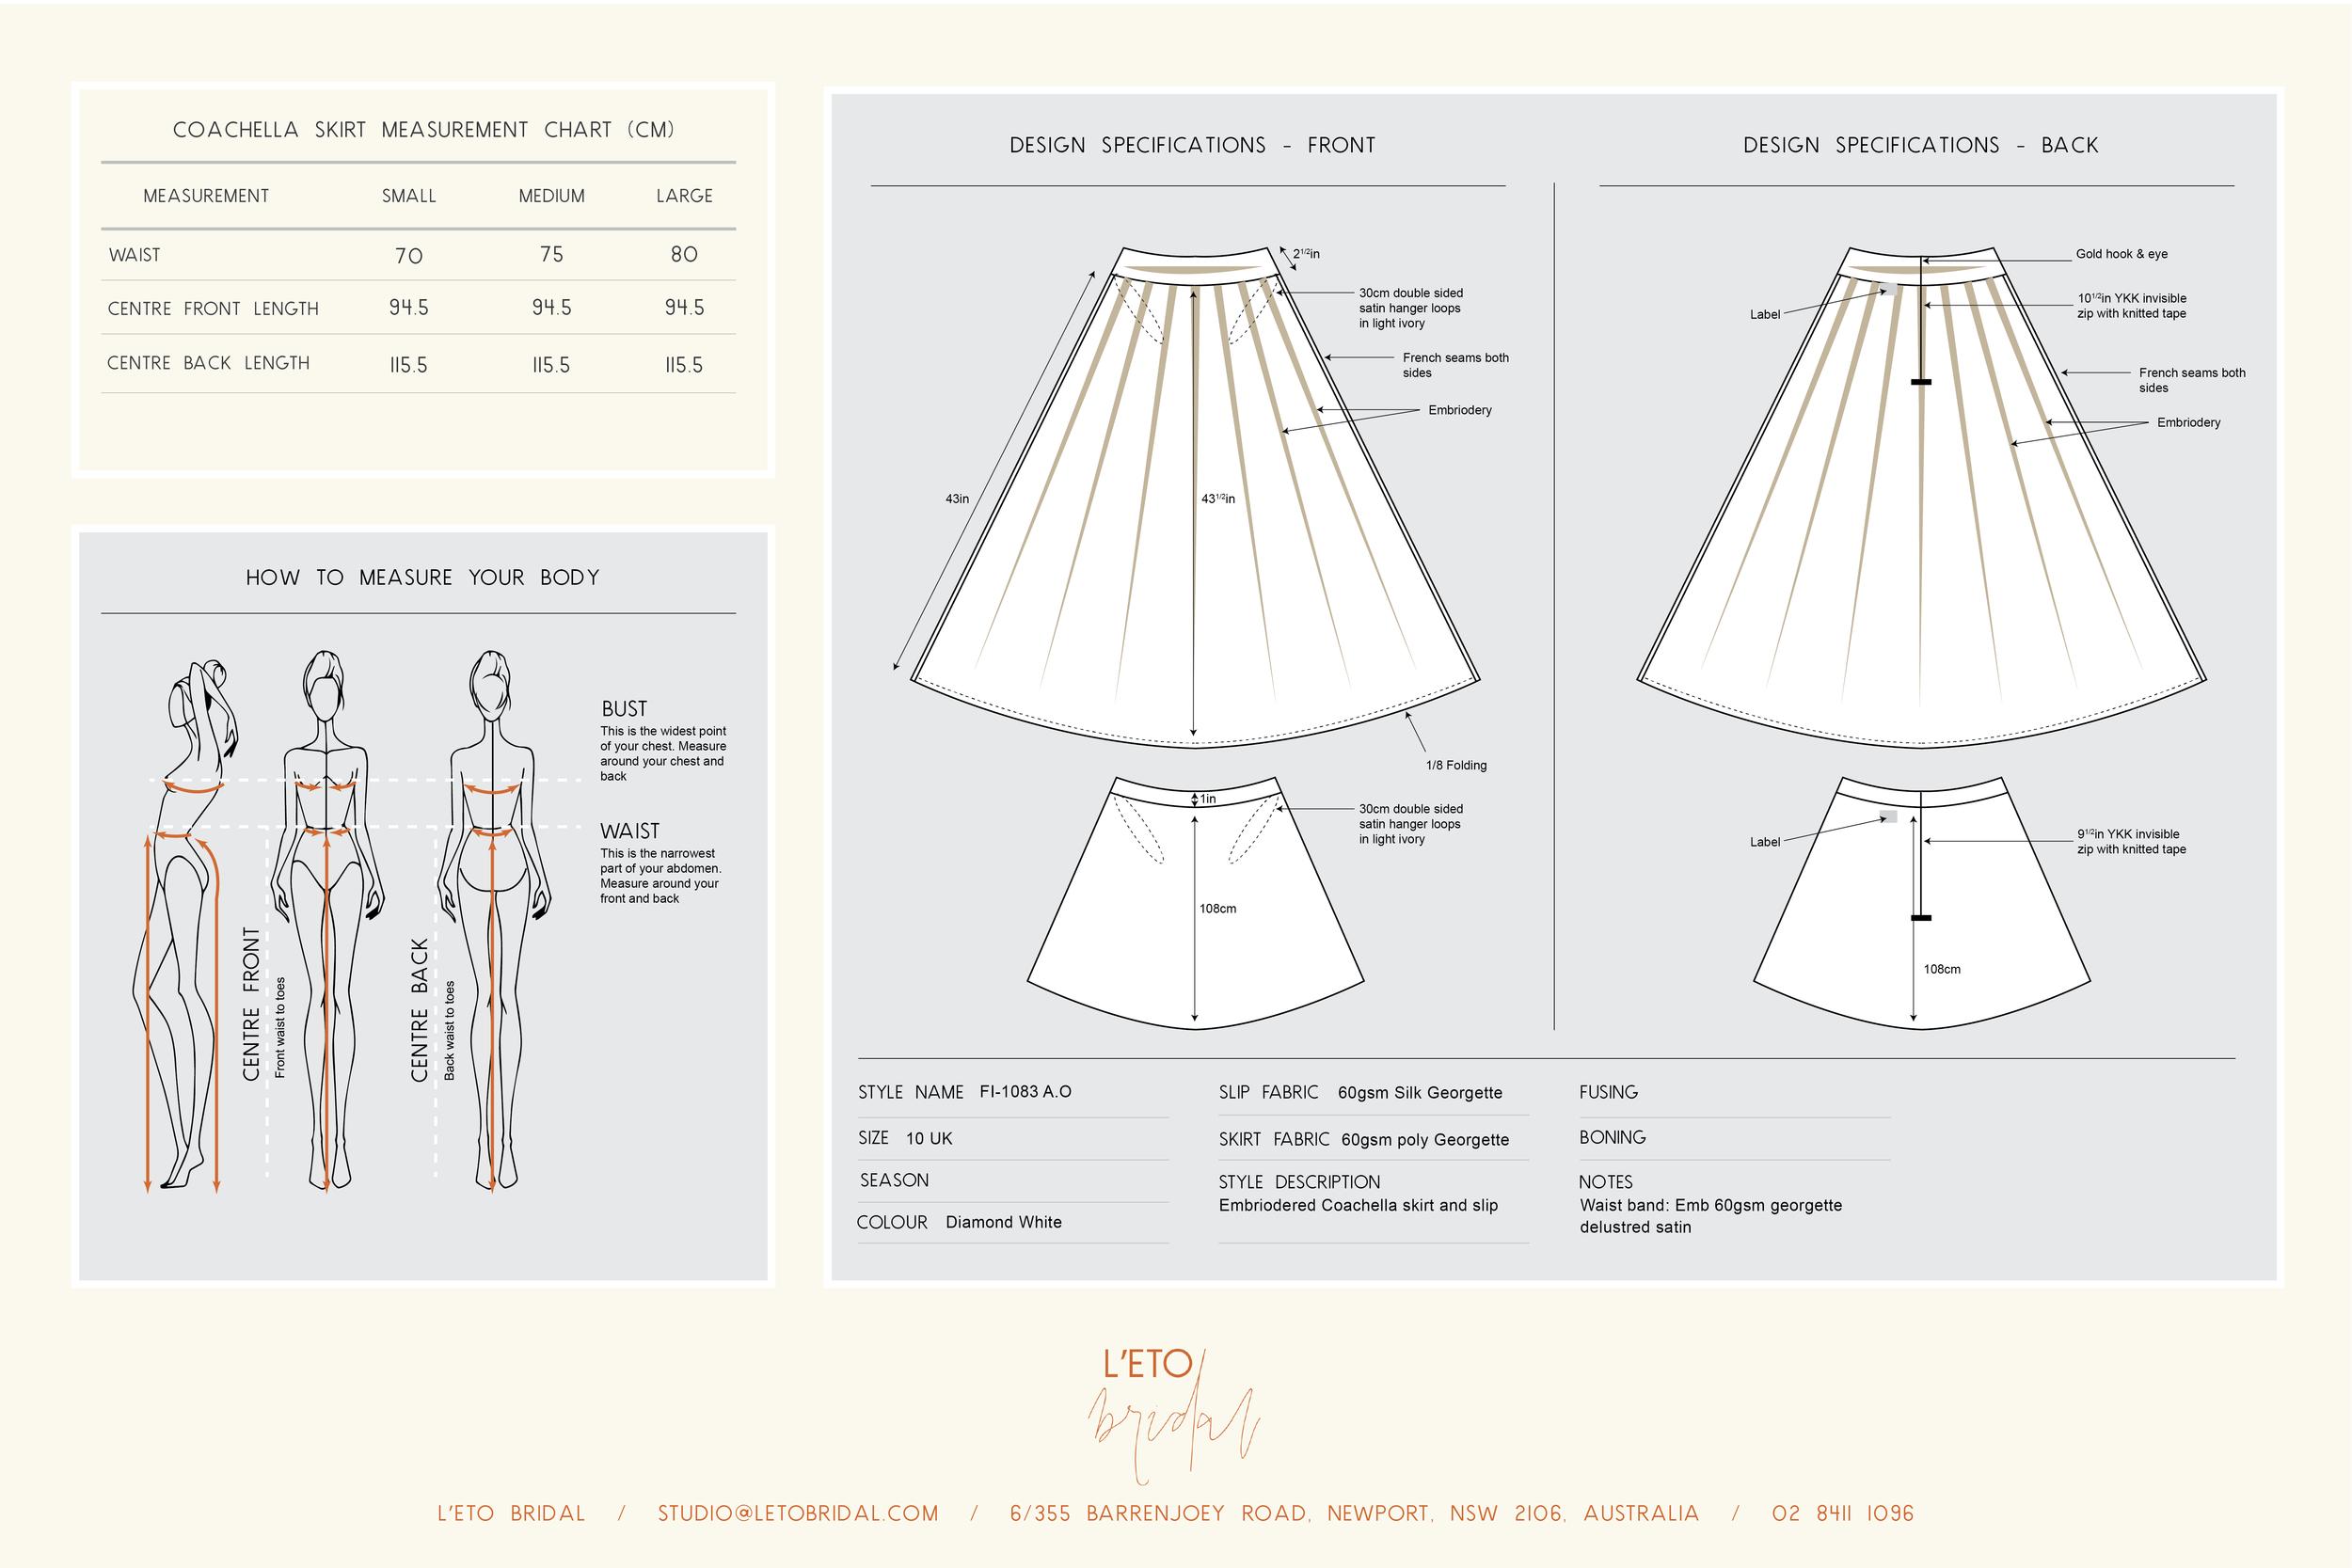 LETO Bridal Coachella skirt.png